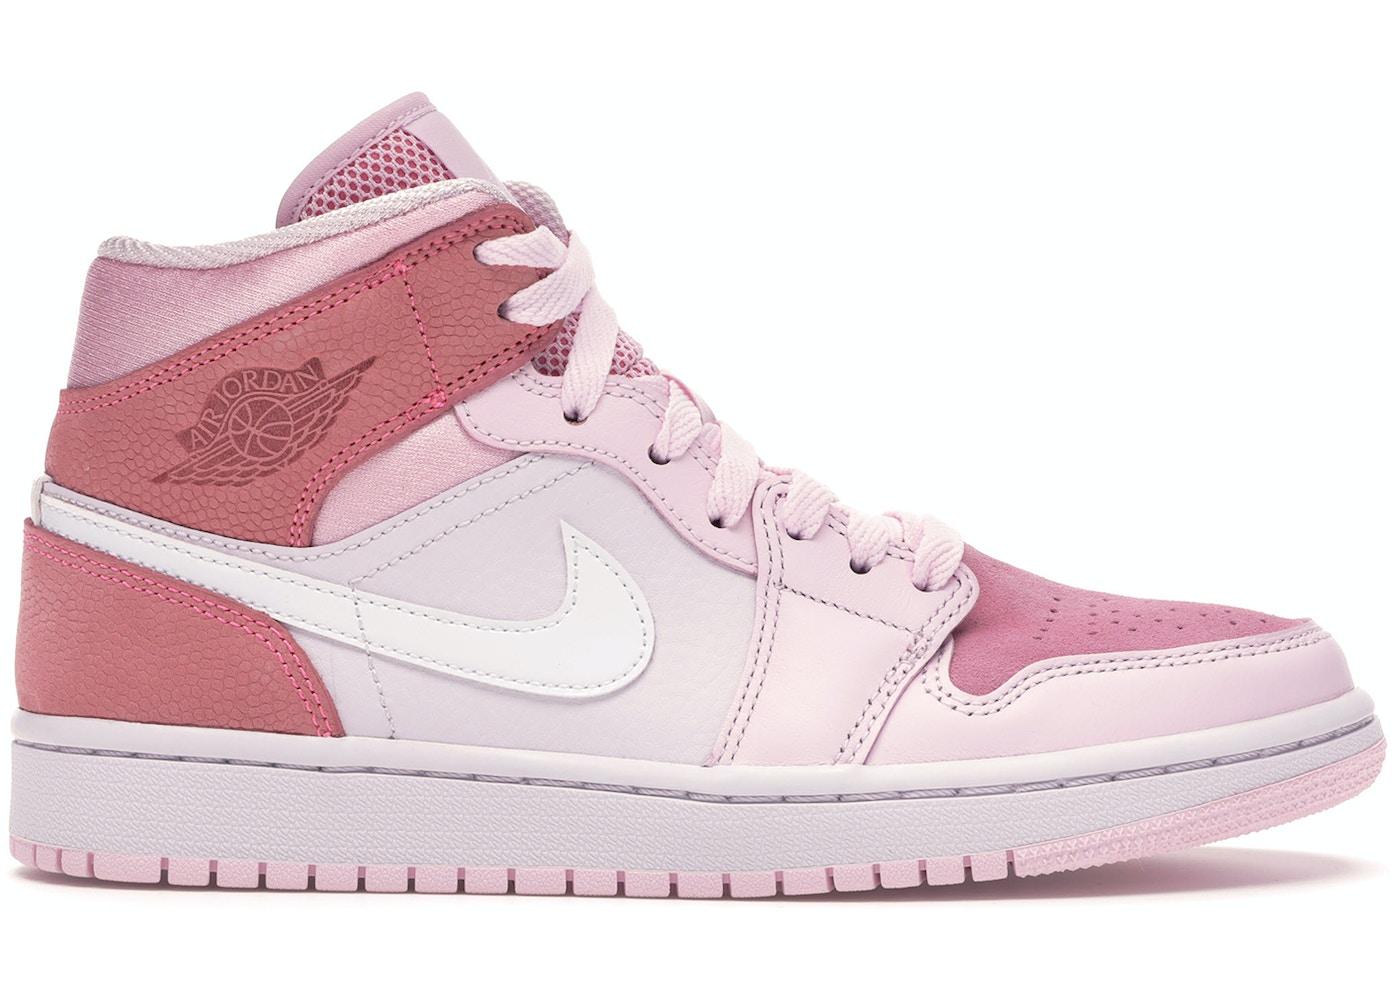 Jordan 1 Mid Digital Pink W Cw5379 600